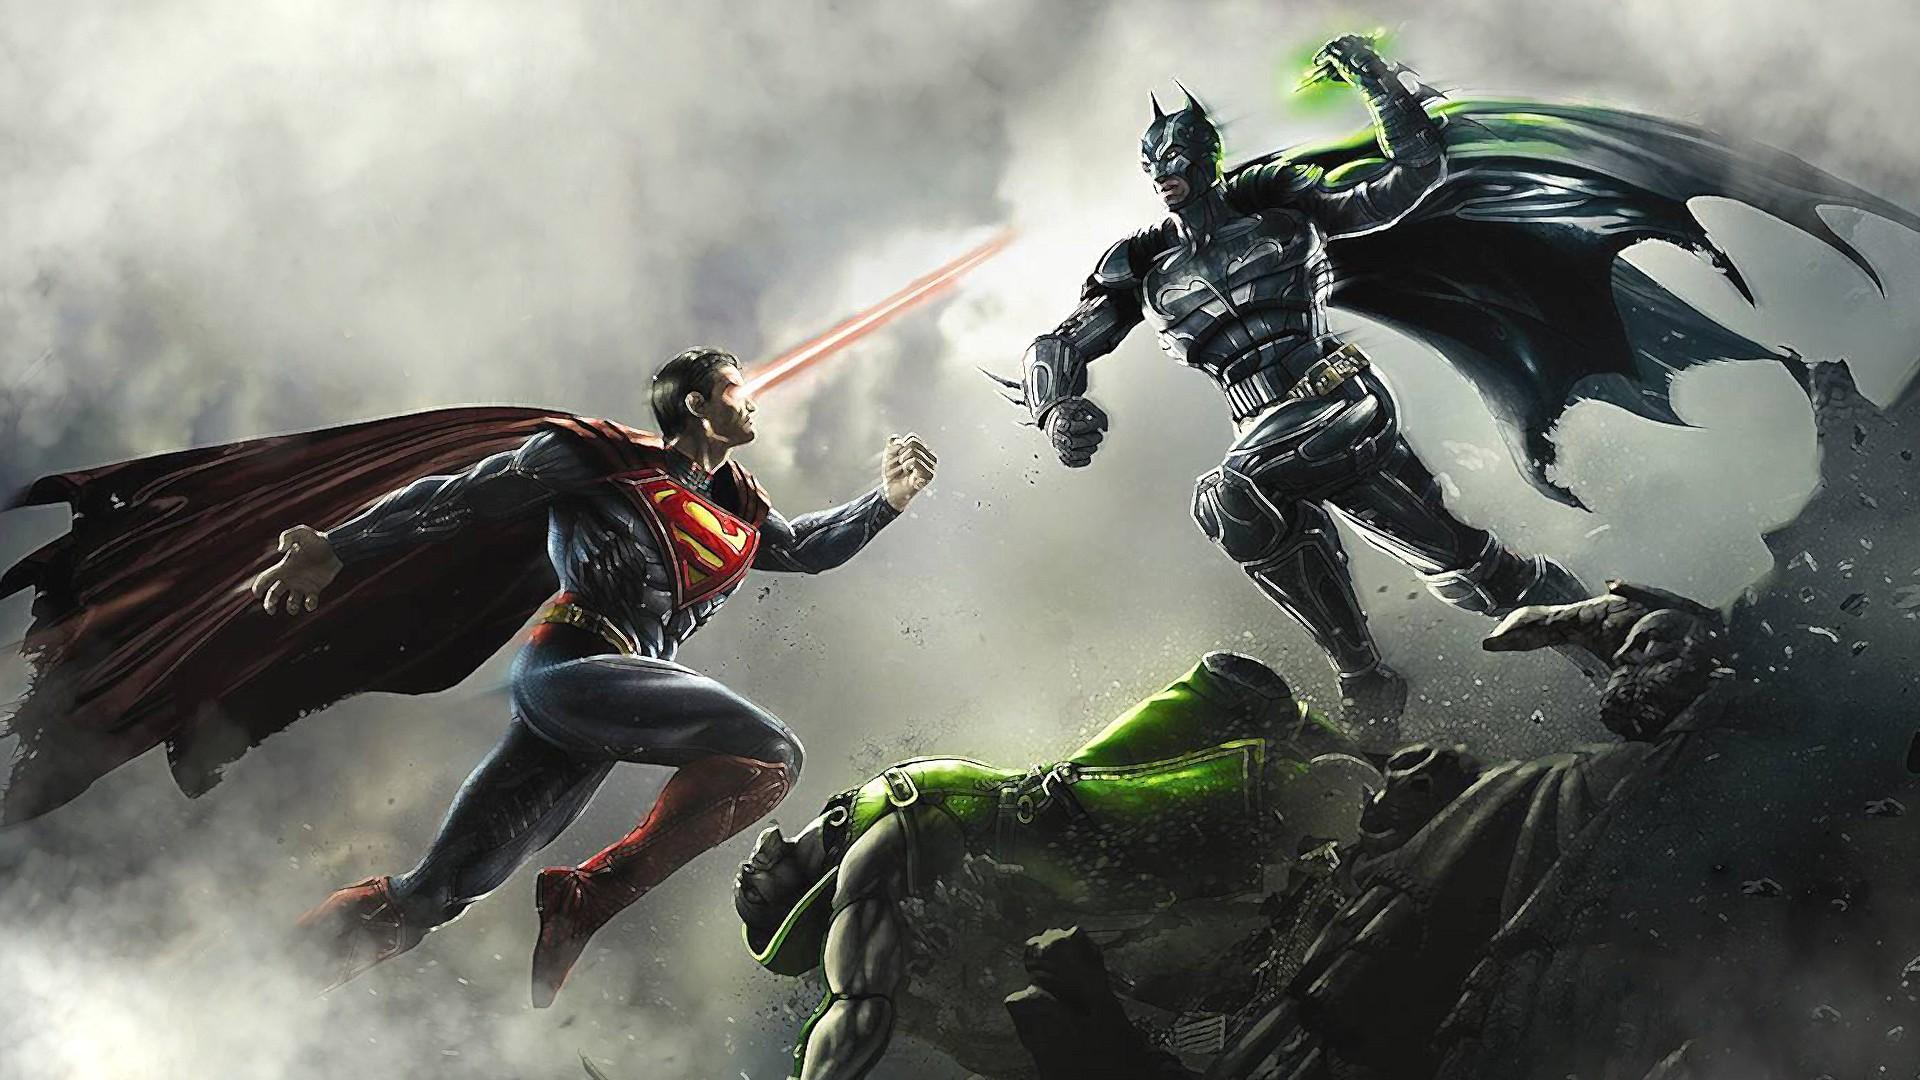 Batman Joker Full Hd Wallpaper Batman And Superman Wallpaper Background Hd Download Free